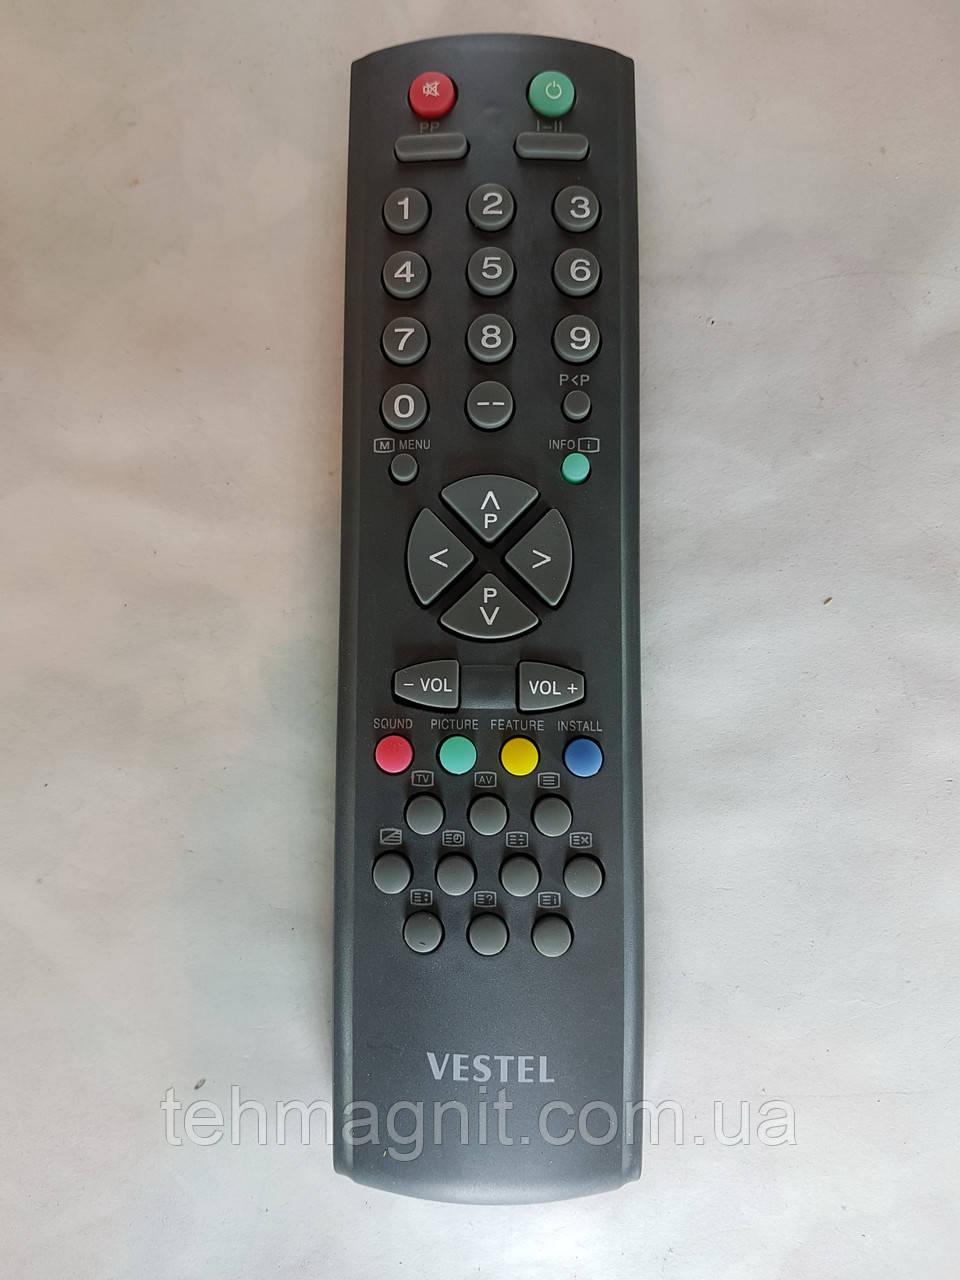 Пульт ДУ для телевизора Rainford, VESTEL